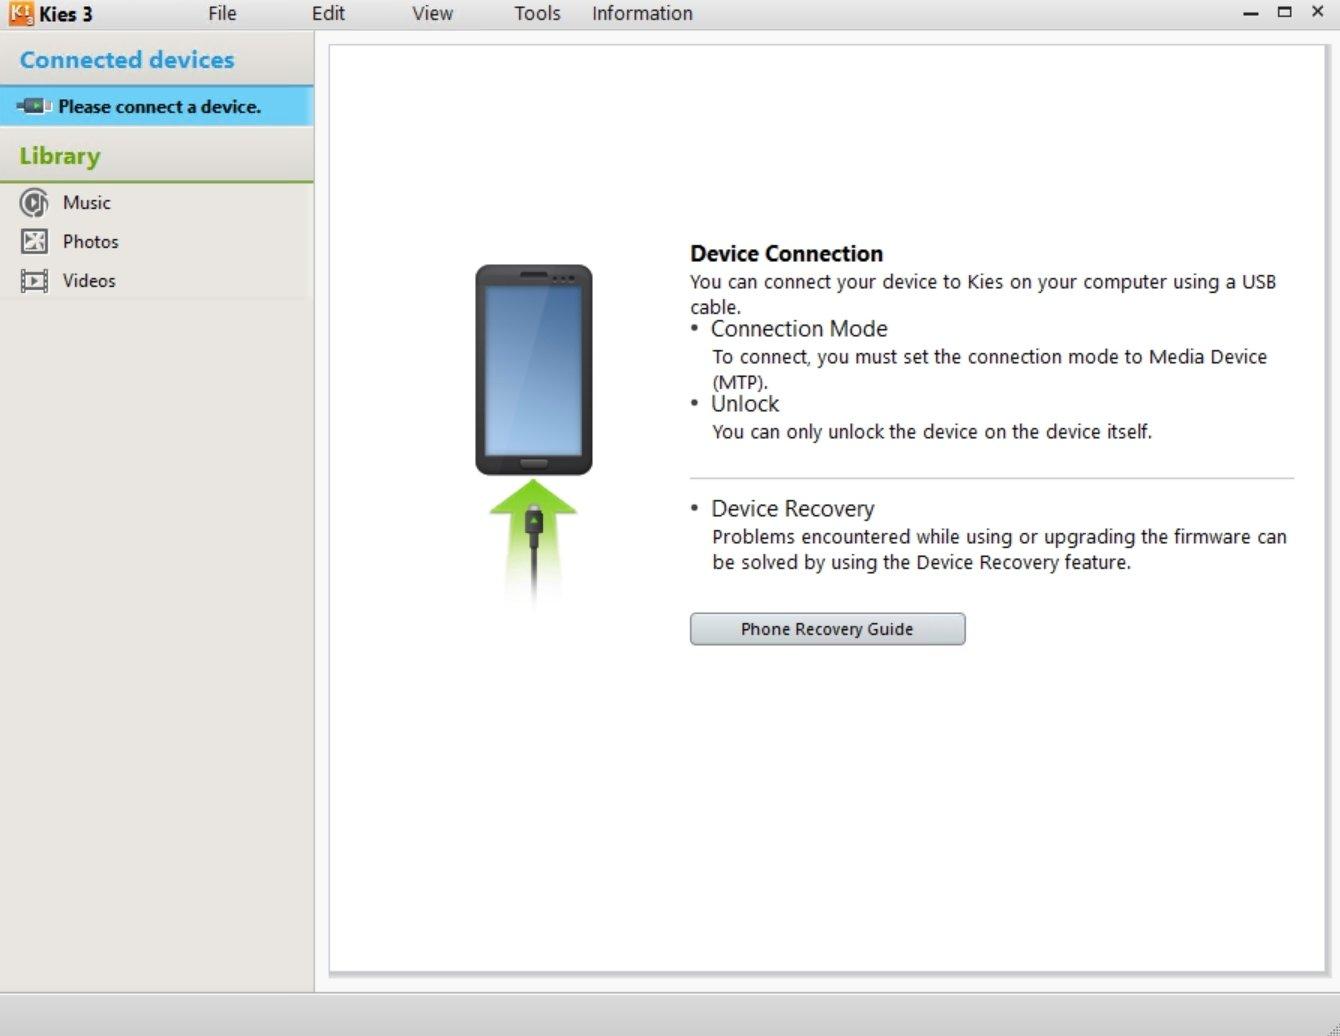 Samsung Kies image 5